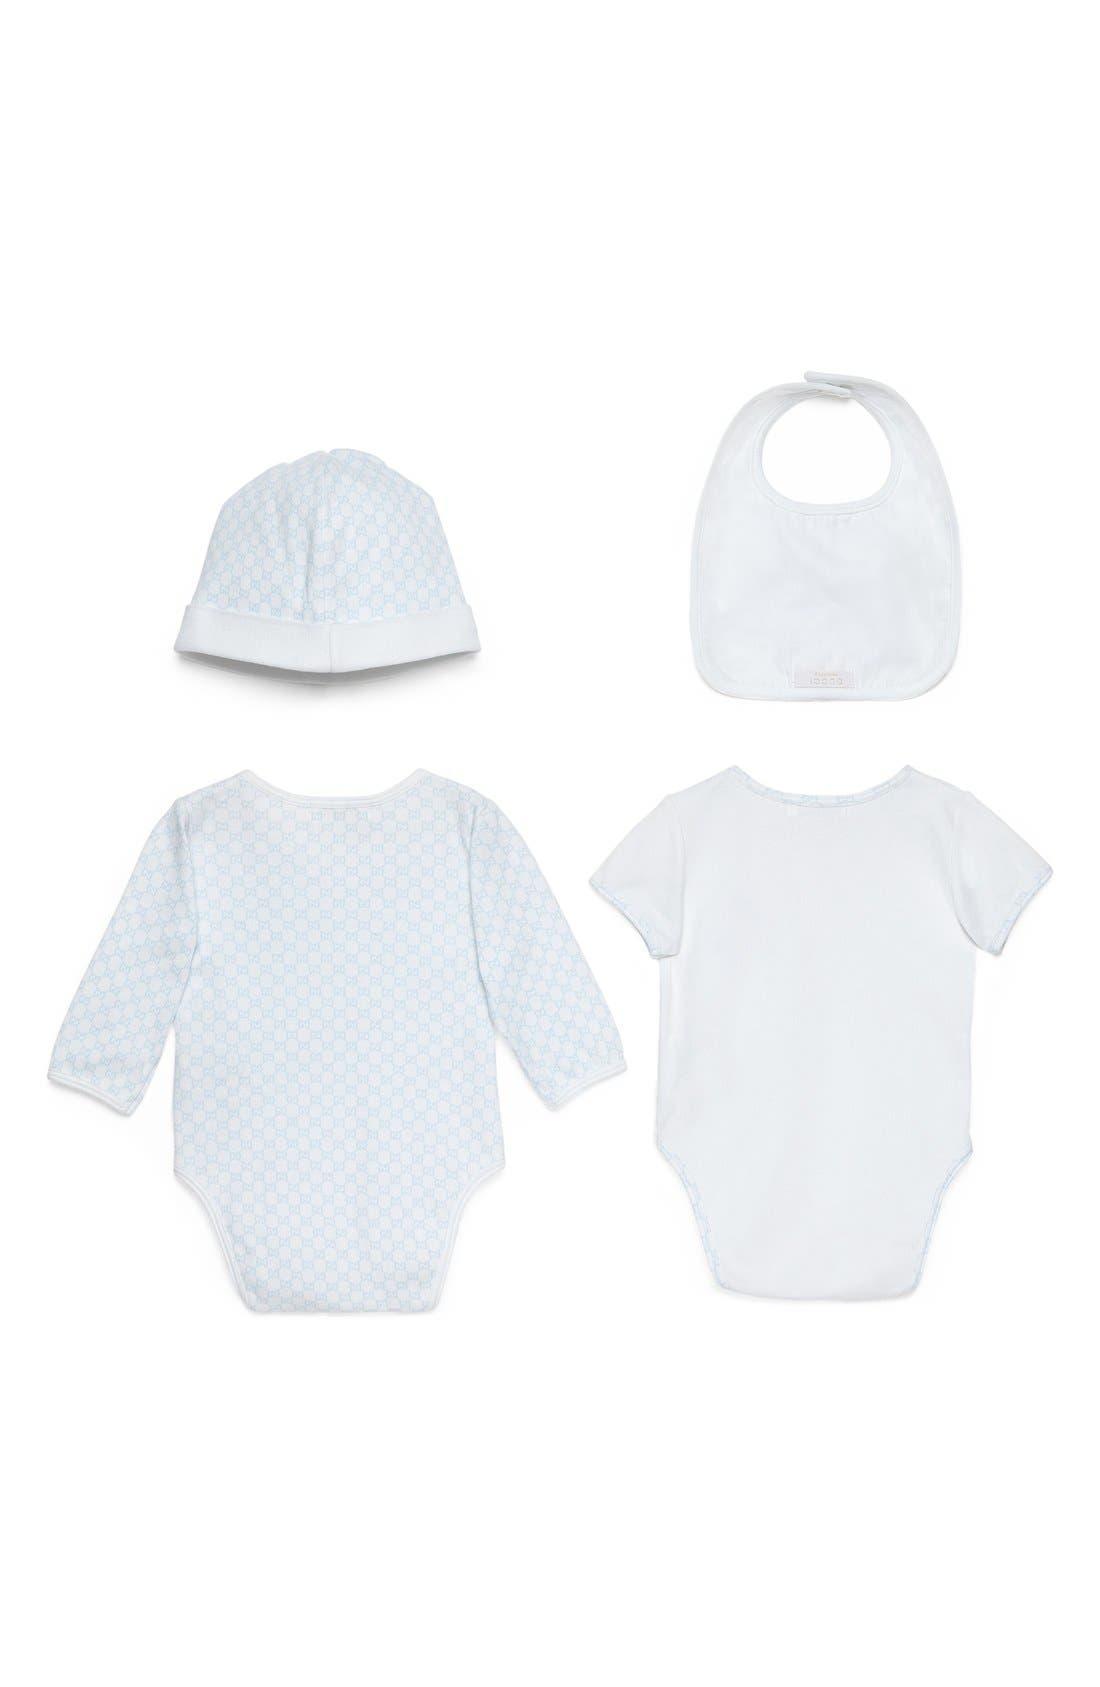 Alternate Image 2  - Gucci Short Sleeve Bodysuit, Long Sleeve Bodysuit, Hat & Bib Set (Baby)